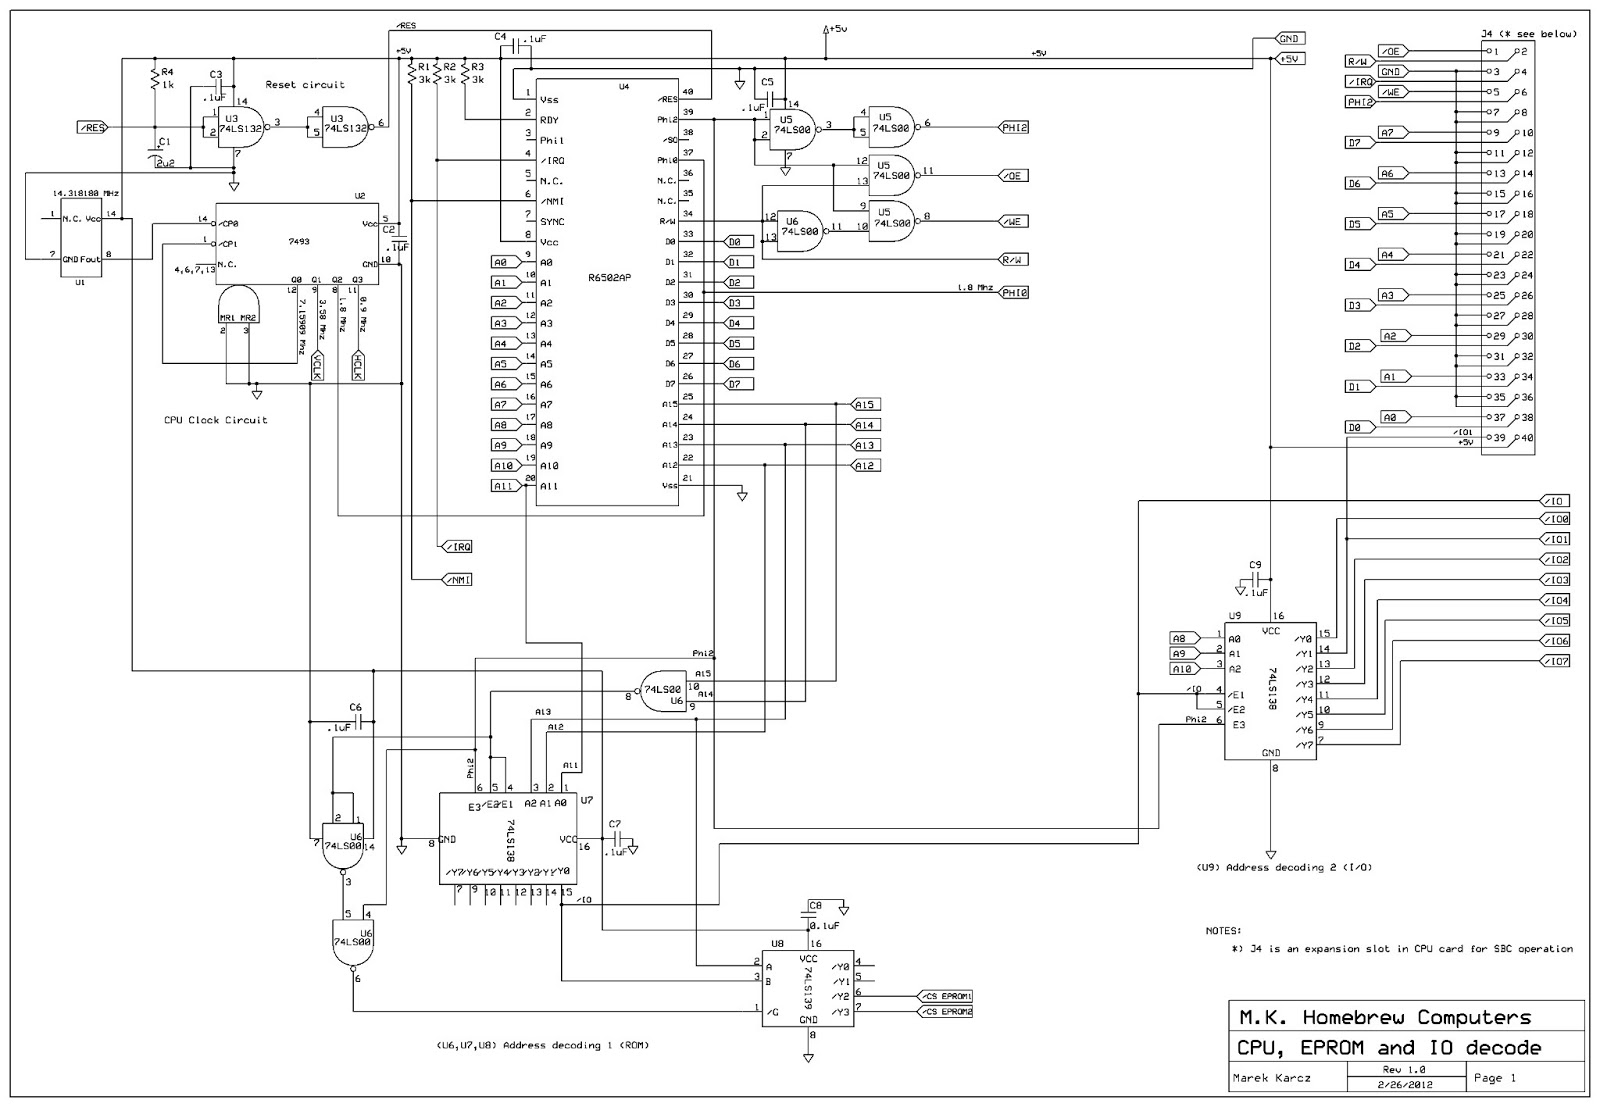 circuit diagram of a phase failure circuit diagram of a cpu homebrew computers: mkhbc-8-r1 homebrew 6502 computer ...